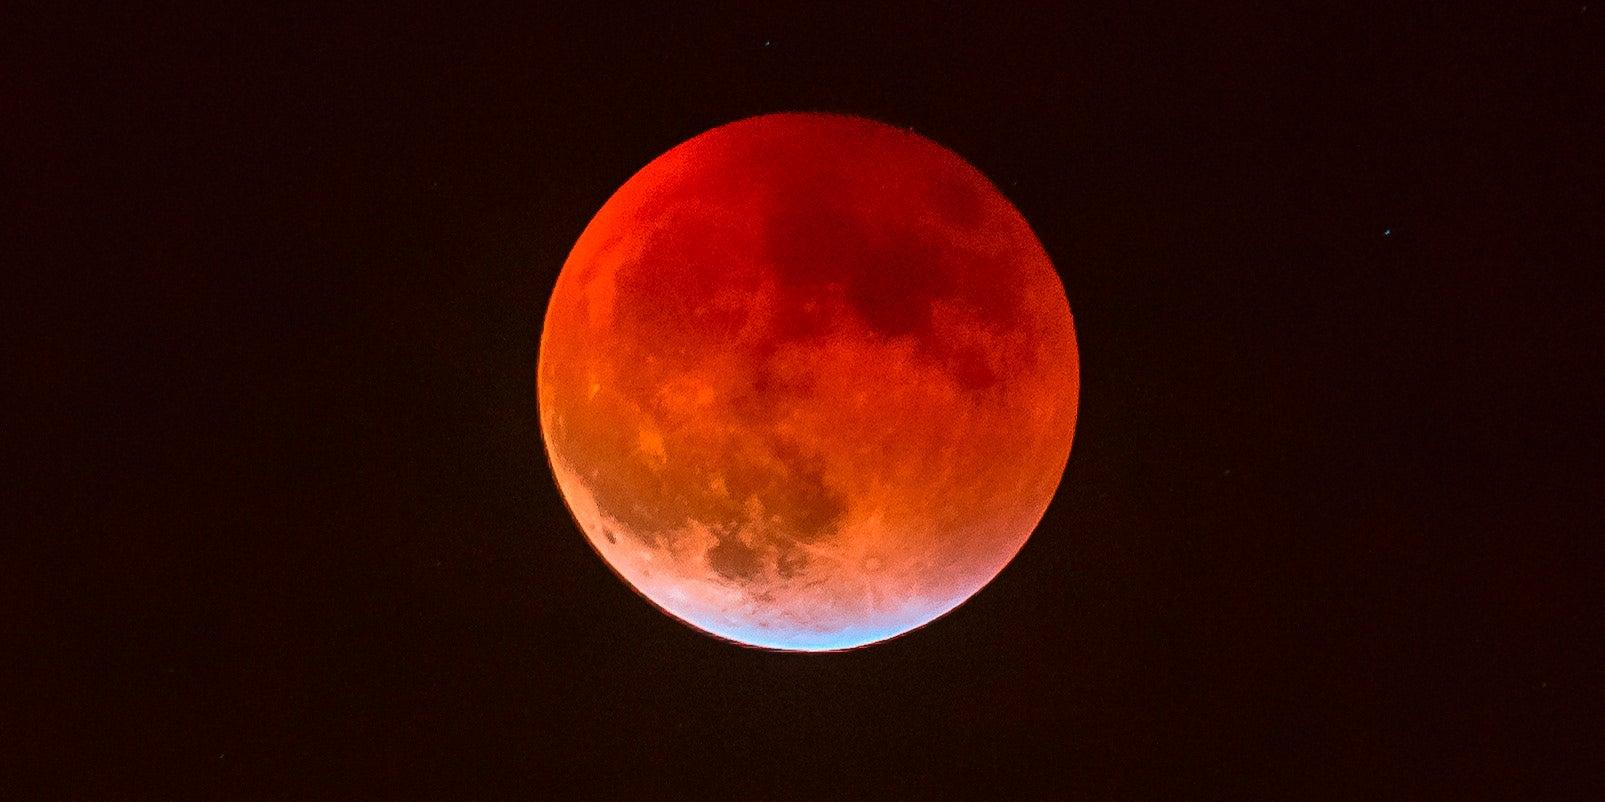 red moon 2018 september - photo #6